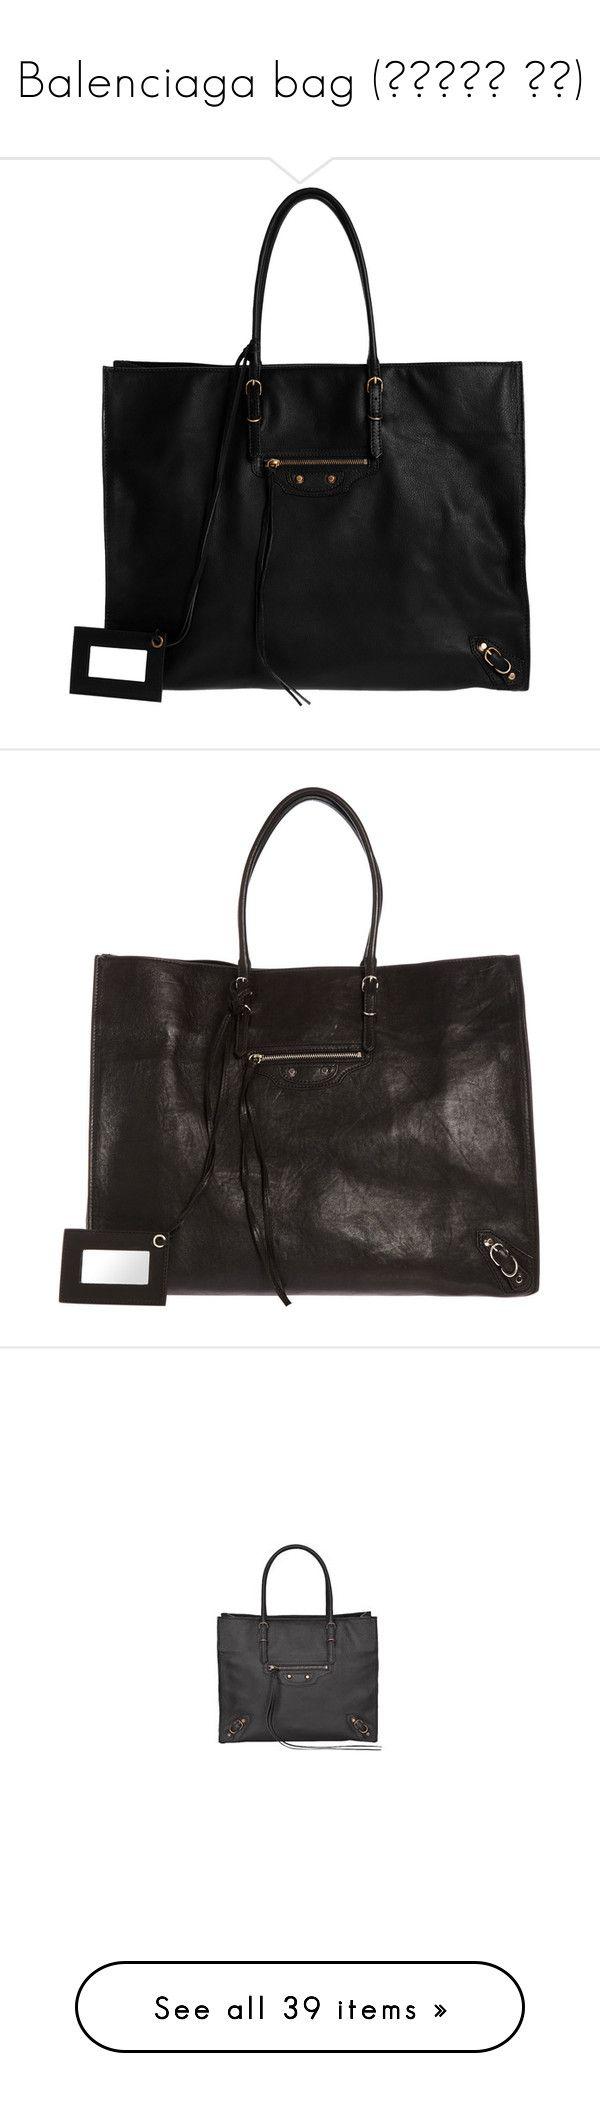 """Balenciaga bag (발렌시아가 가방)"" by ggaggamury ❤ liked on Polyvore featuring bags, handbags, tote bags, balenciaga, totes, top handle purse, balenciaga purse, tote bag purse, travel tote bags and women"